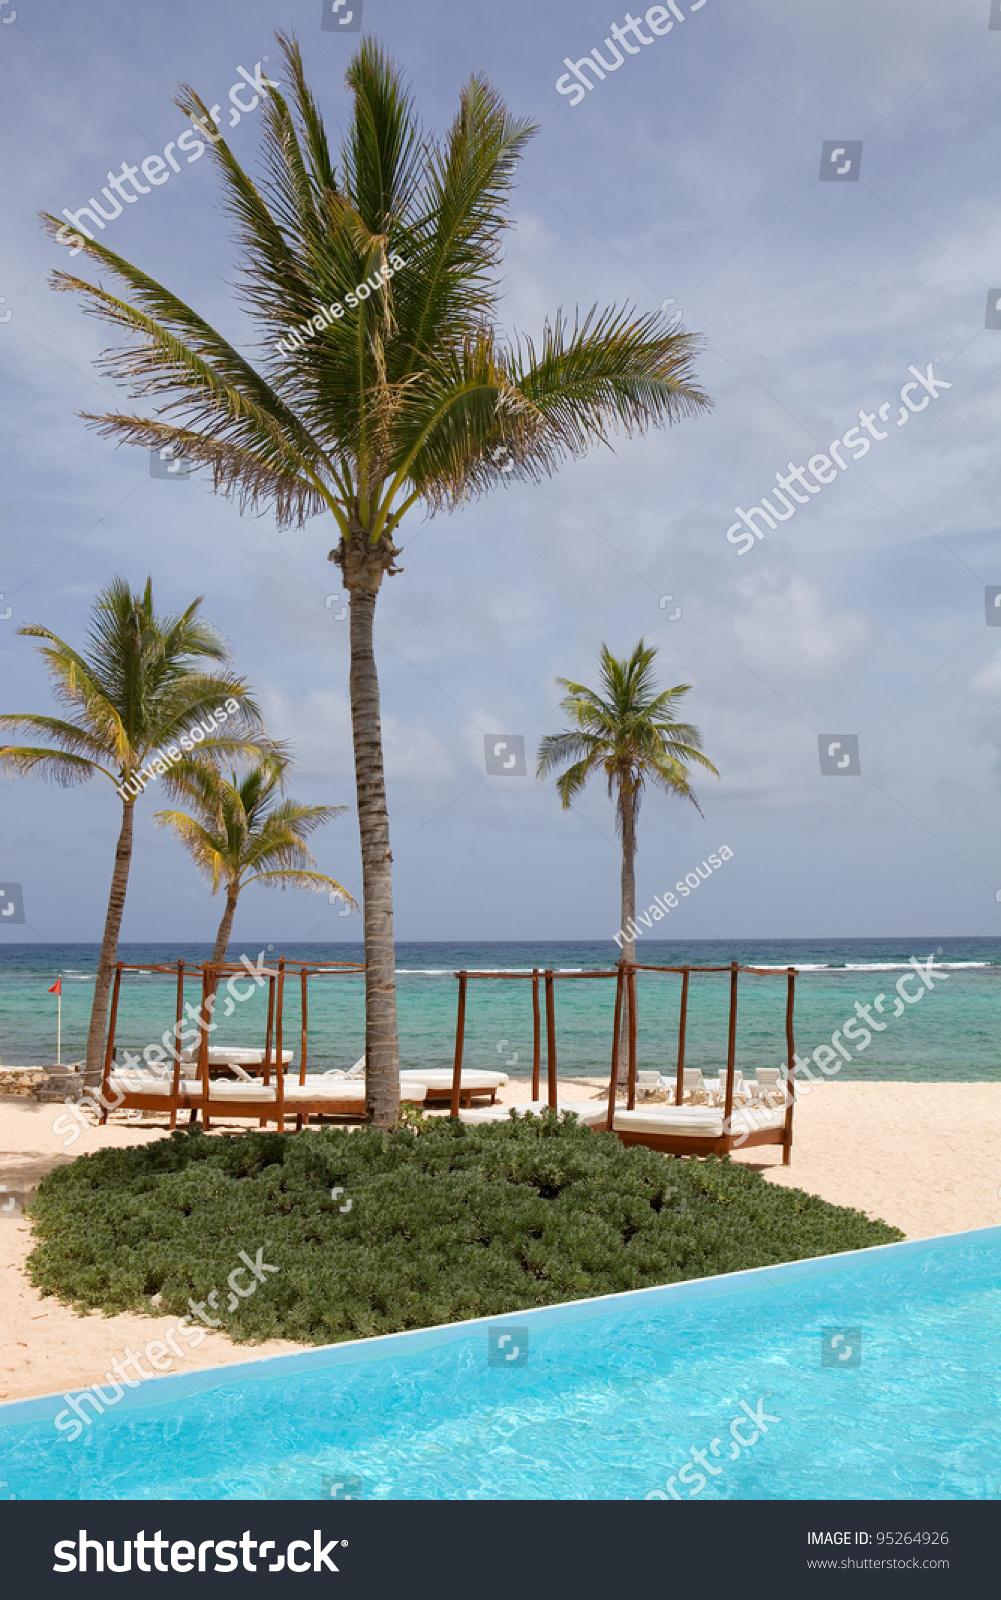 resort detail at the caribbean sea yucatan mexico stock. Black Bedroom Furniture Sets. Home Design Ideas